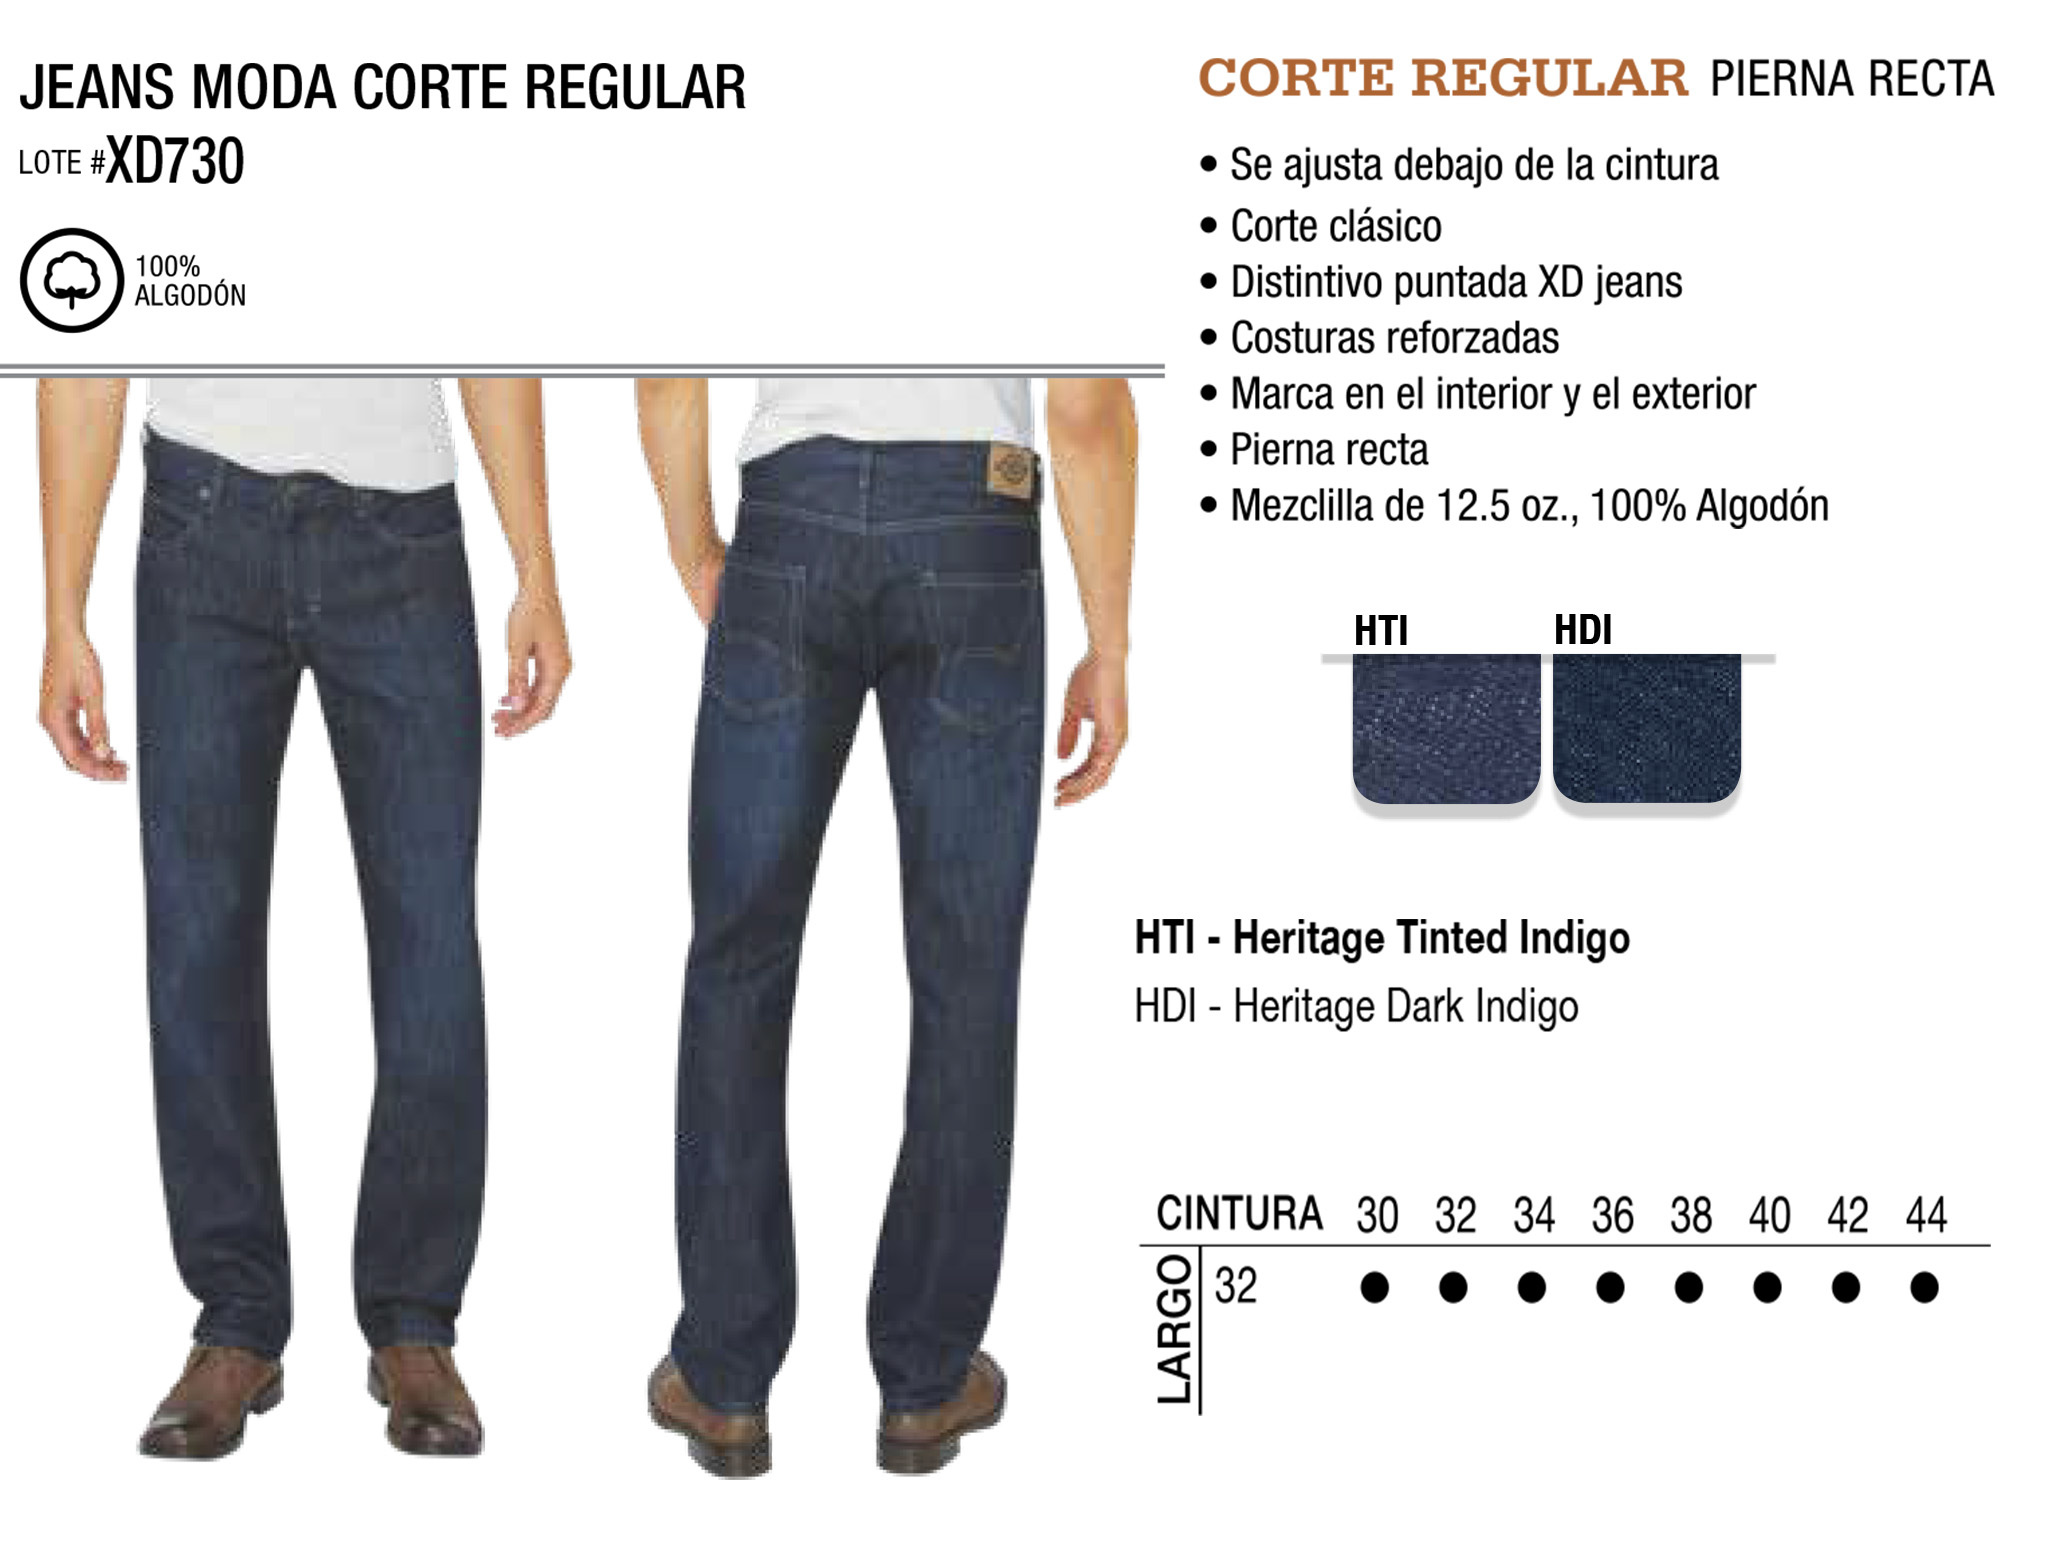 Jeans Moda Corte Regular. Corte Regular. XD730.